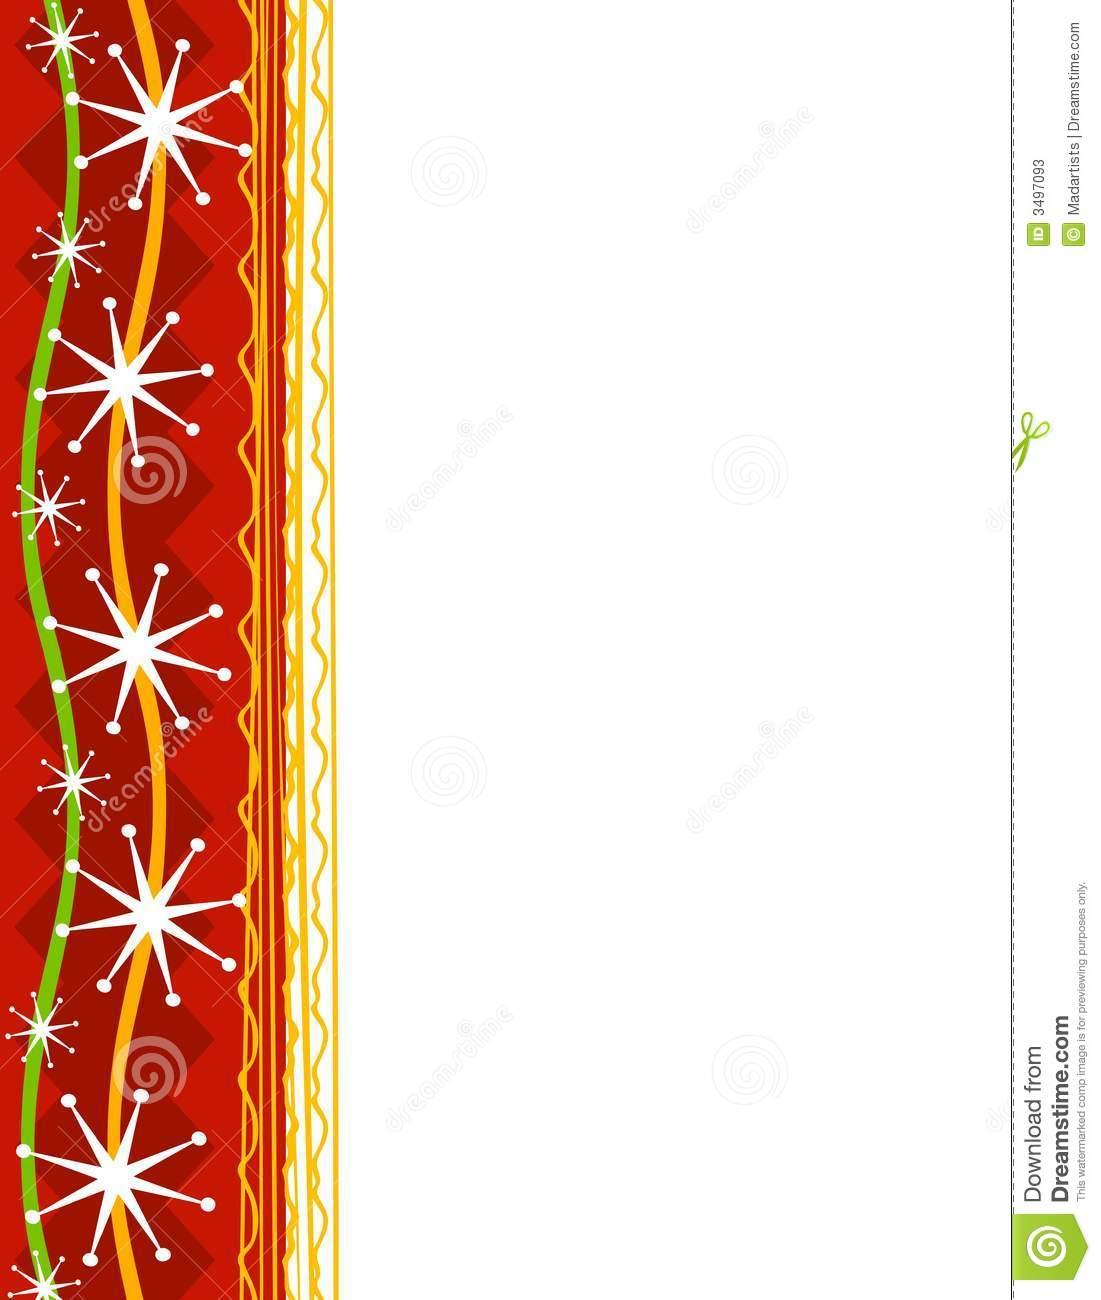 decorative christmas border 1 clipart panda free clipart images rh clipartpanda com free decorative corner borders clip art decorative borders clip art free download